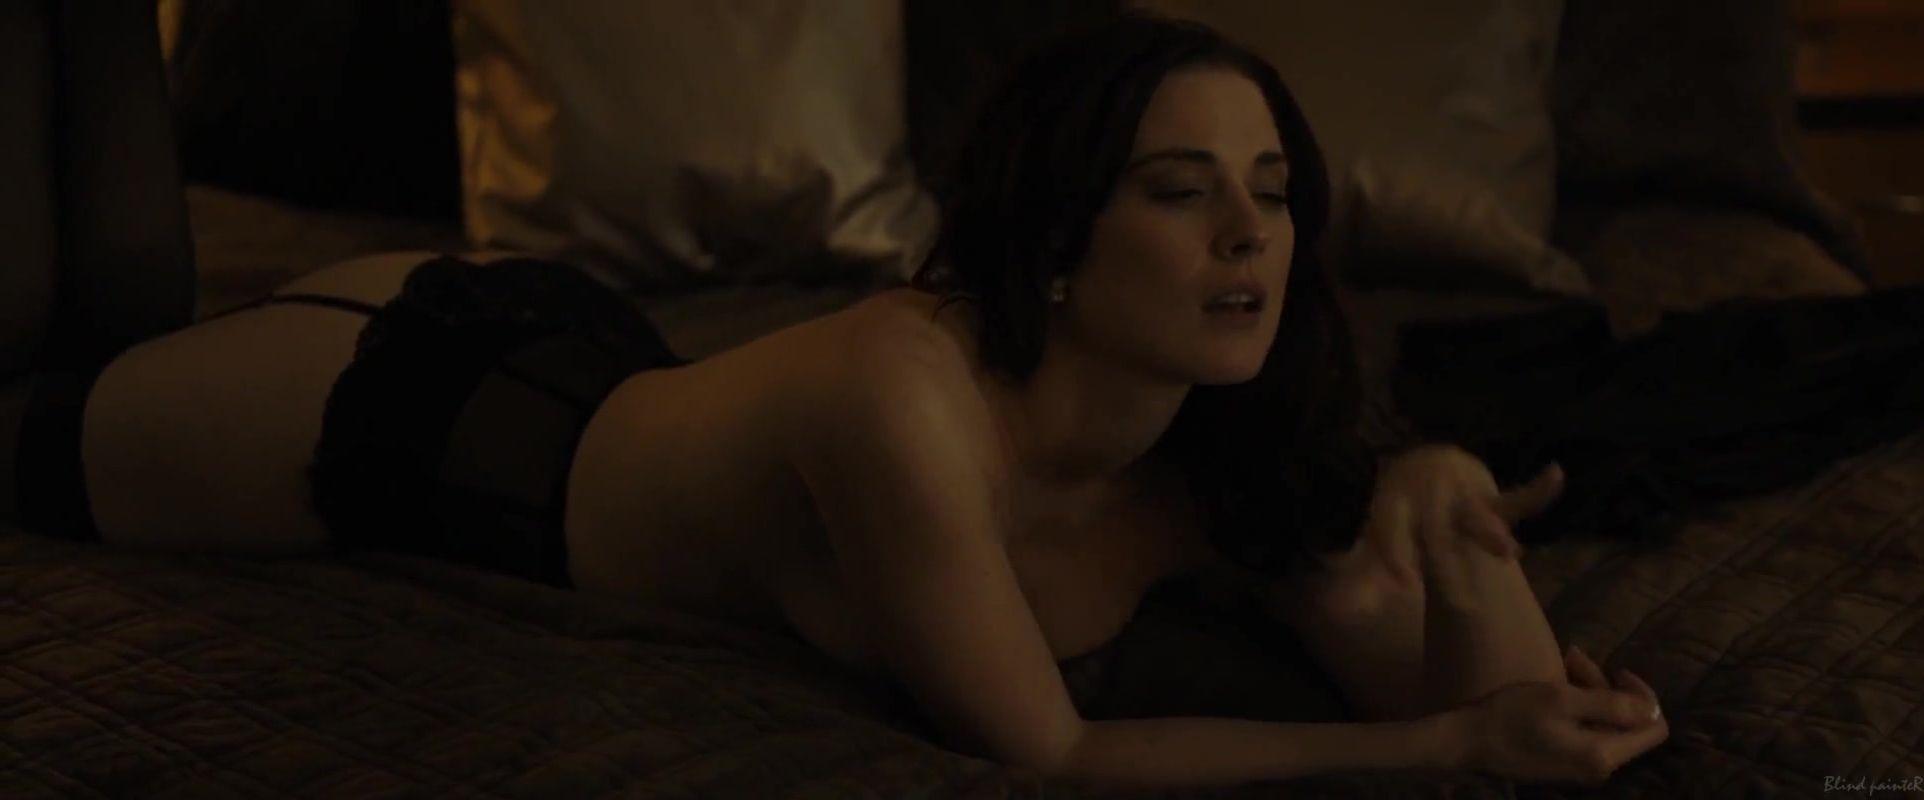 Alexandra breckenridge porn